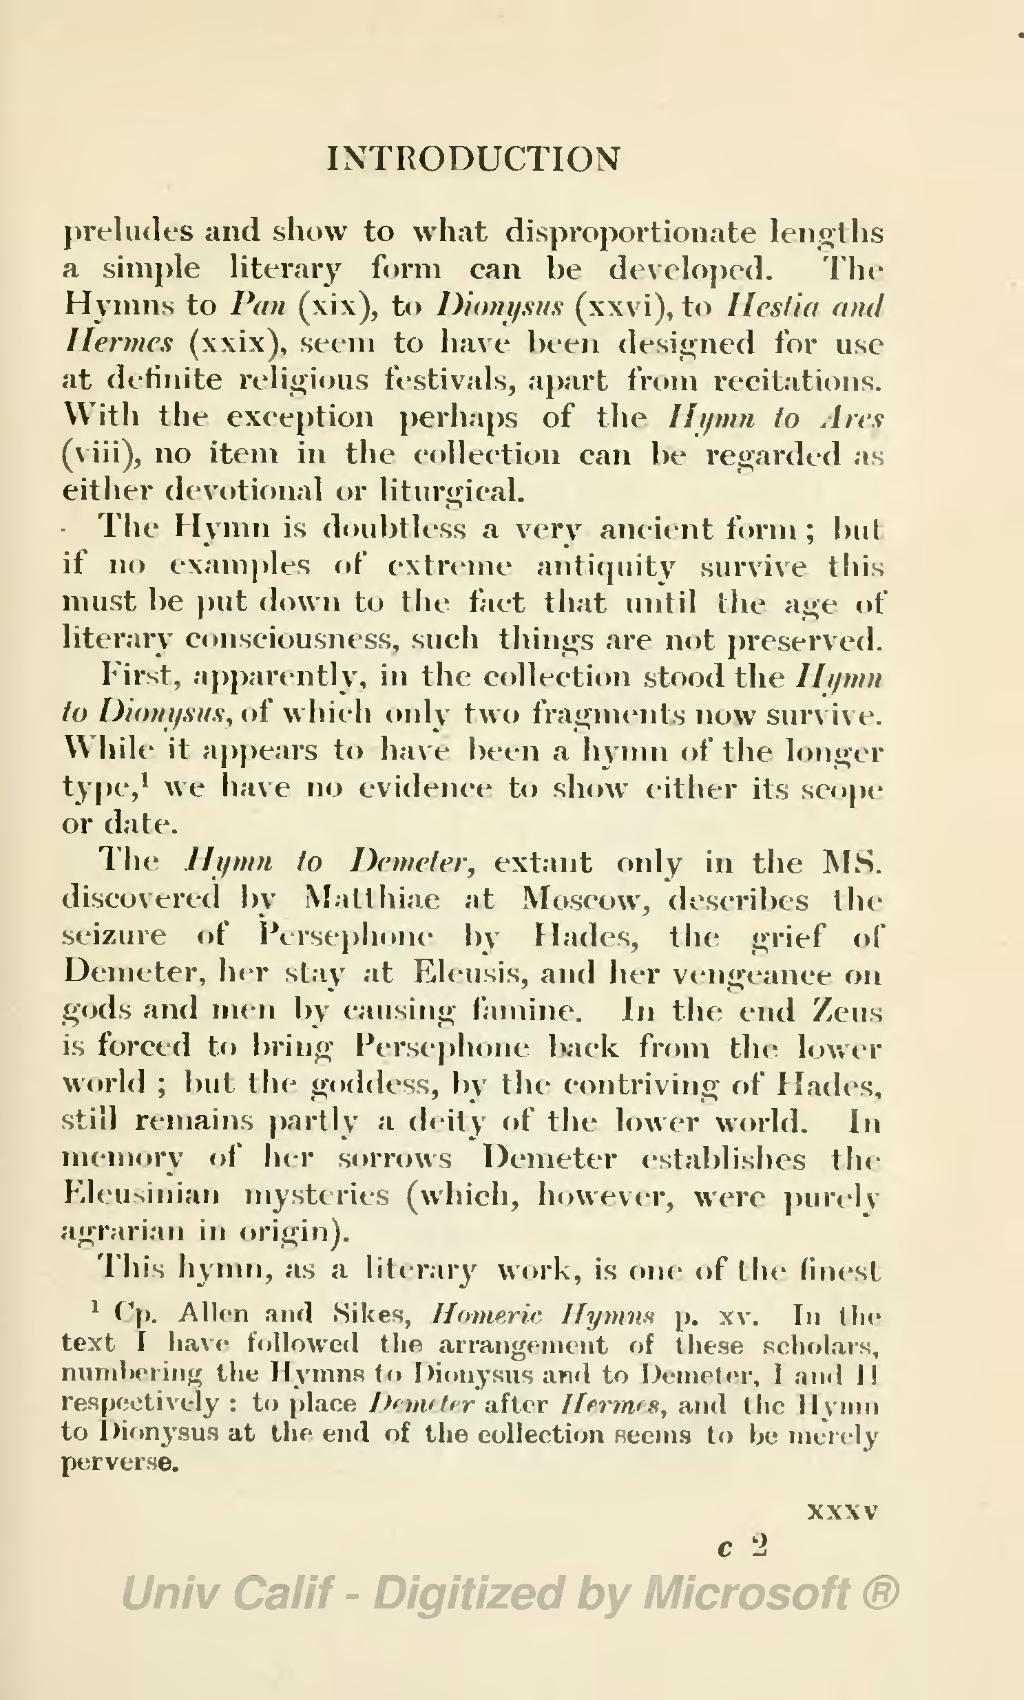 homeric hymn to dionysus